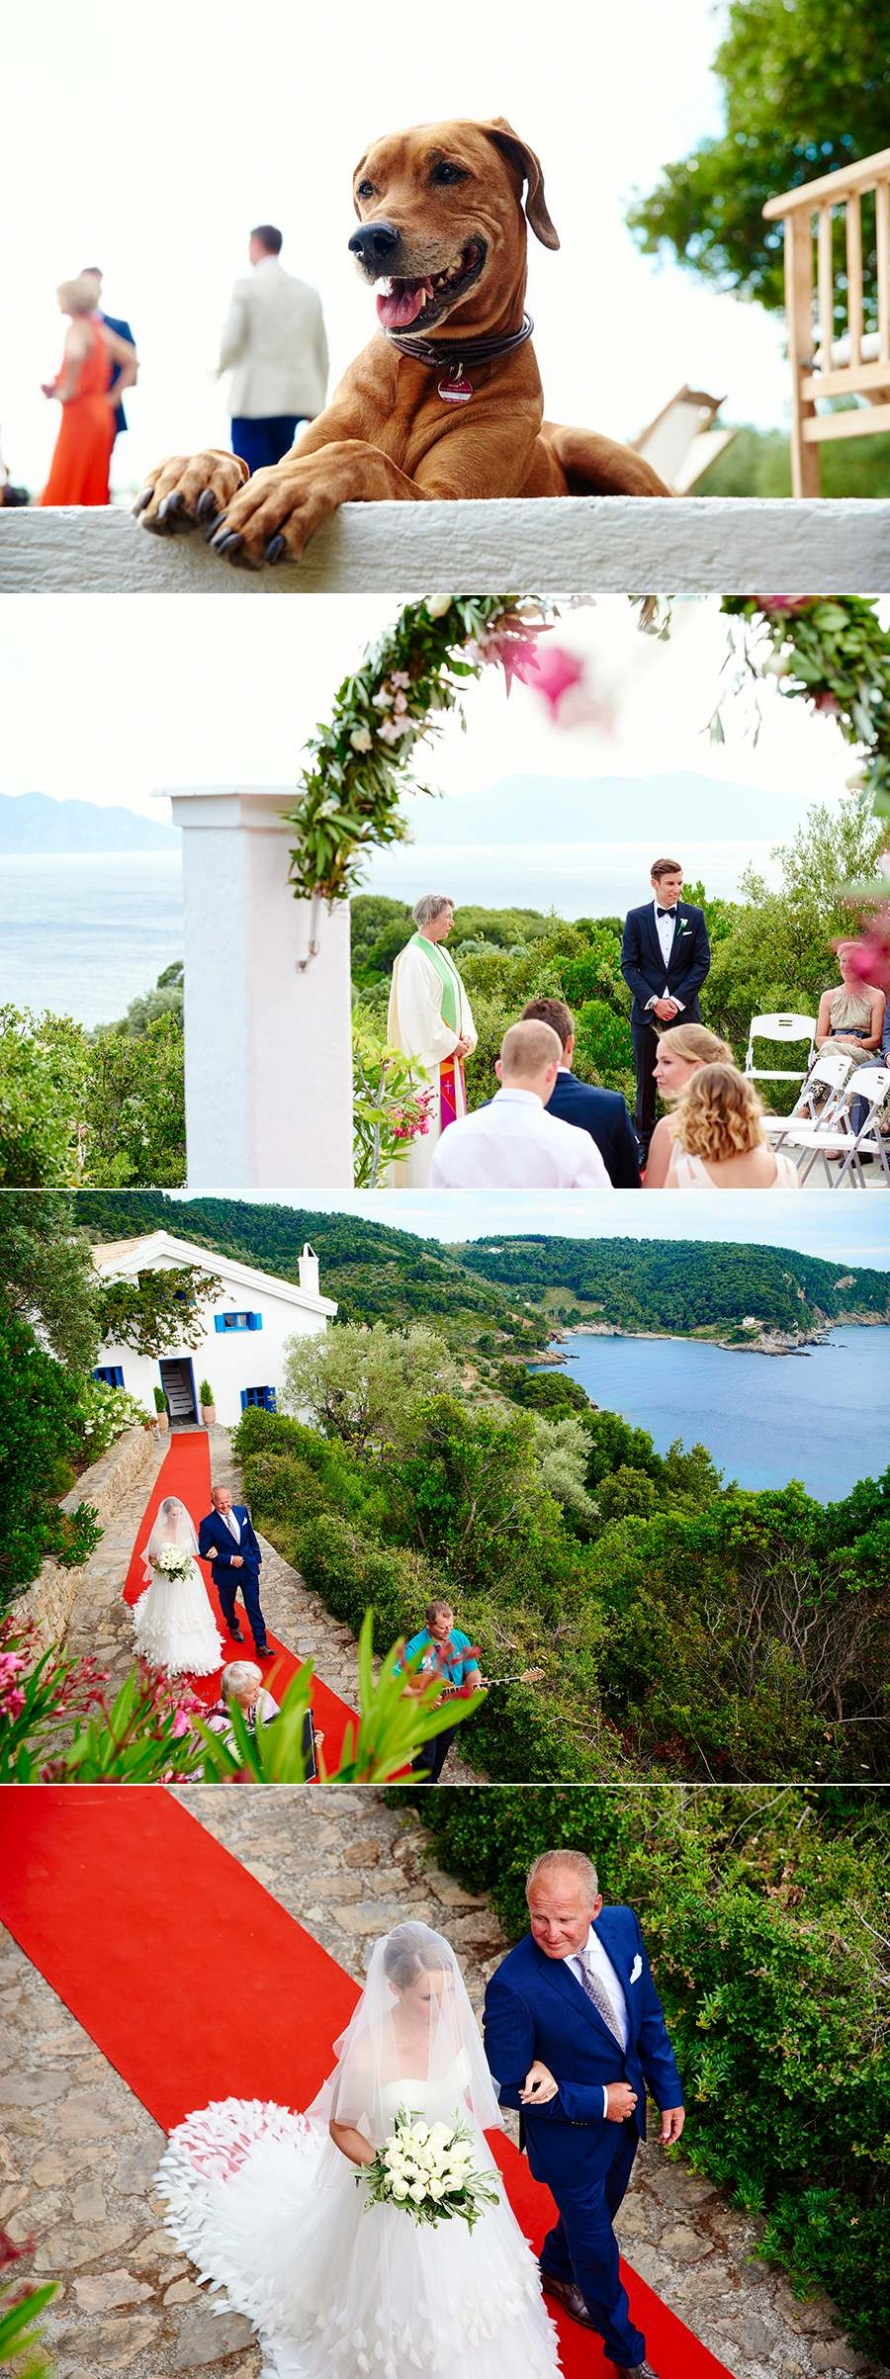 Tobi & Vanessa wedding photos 12